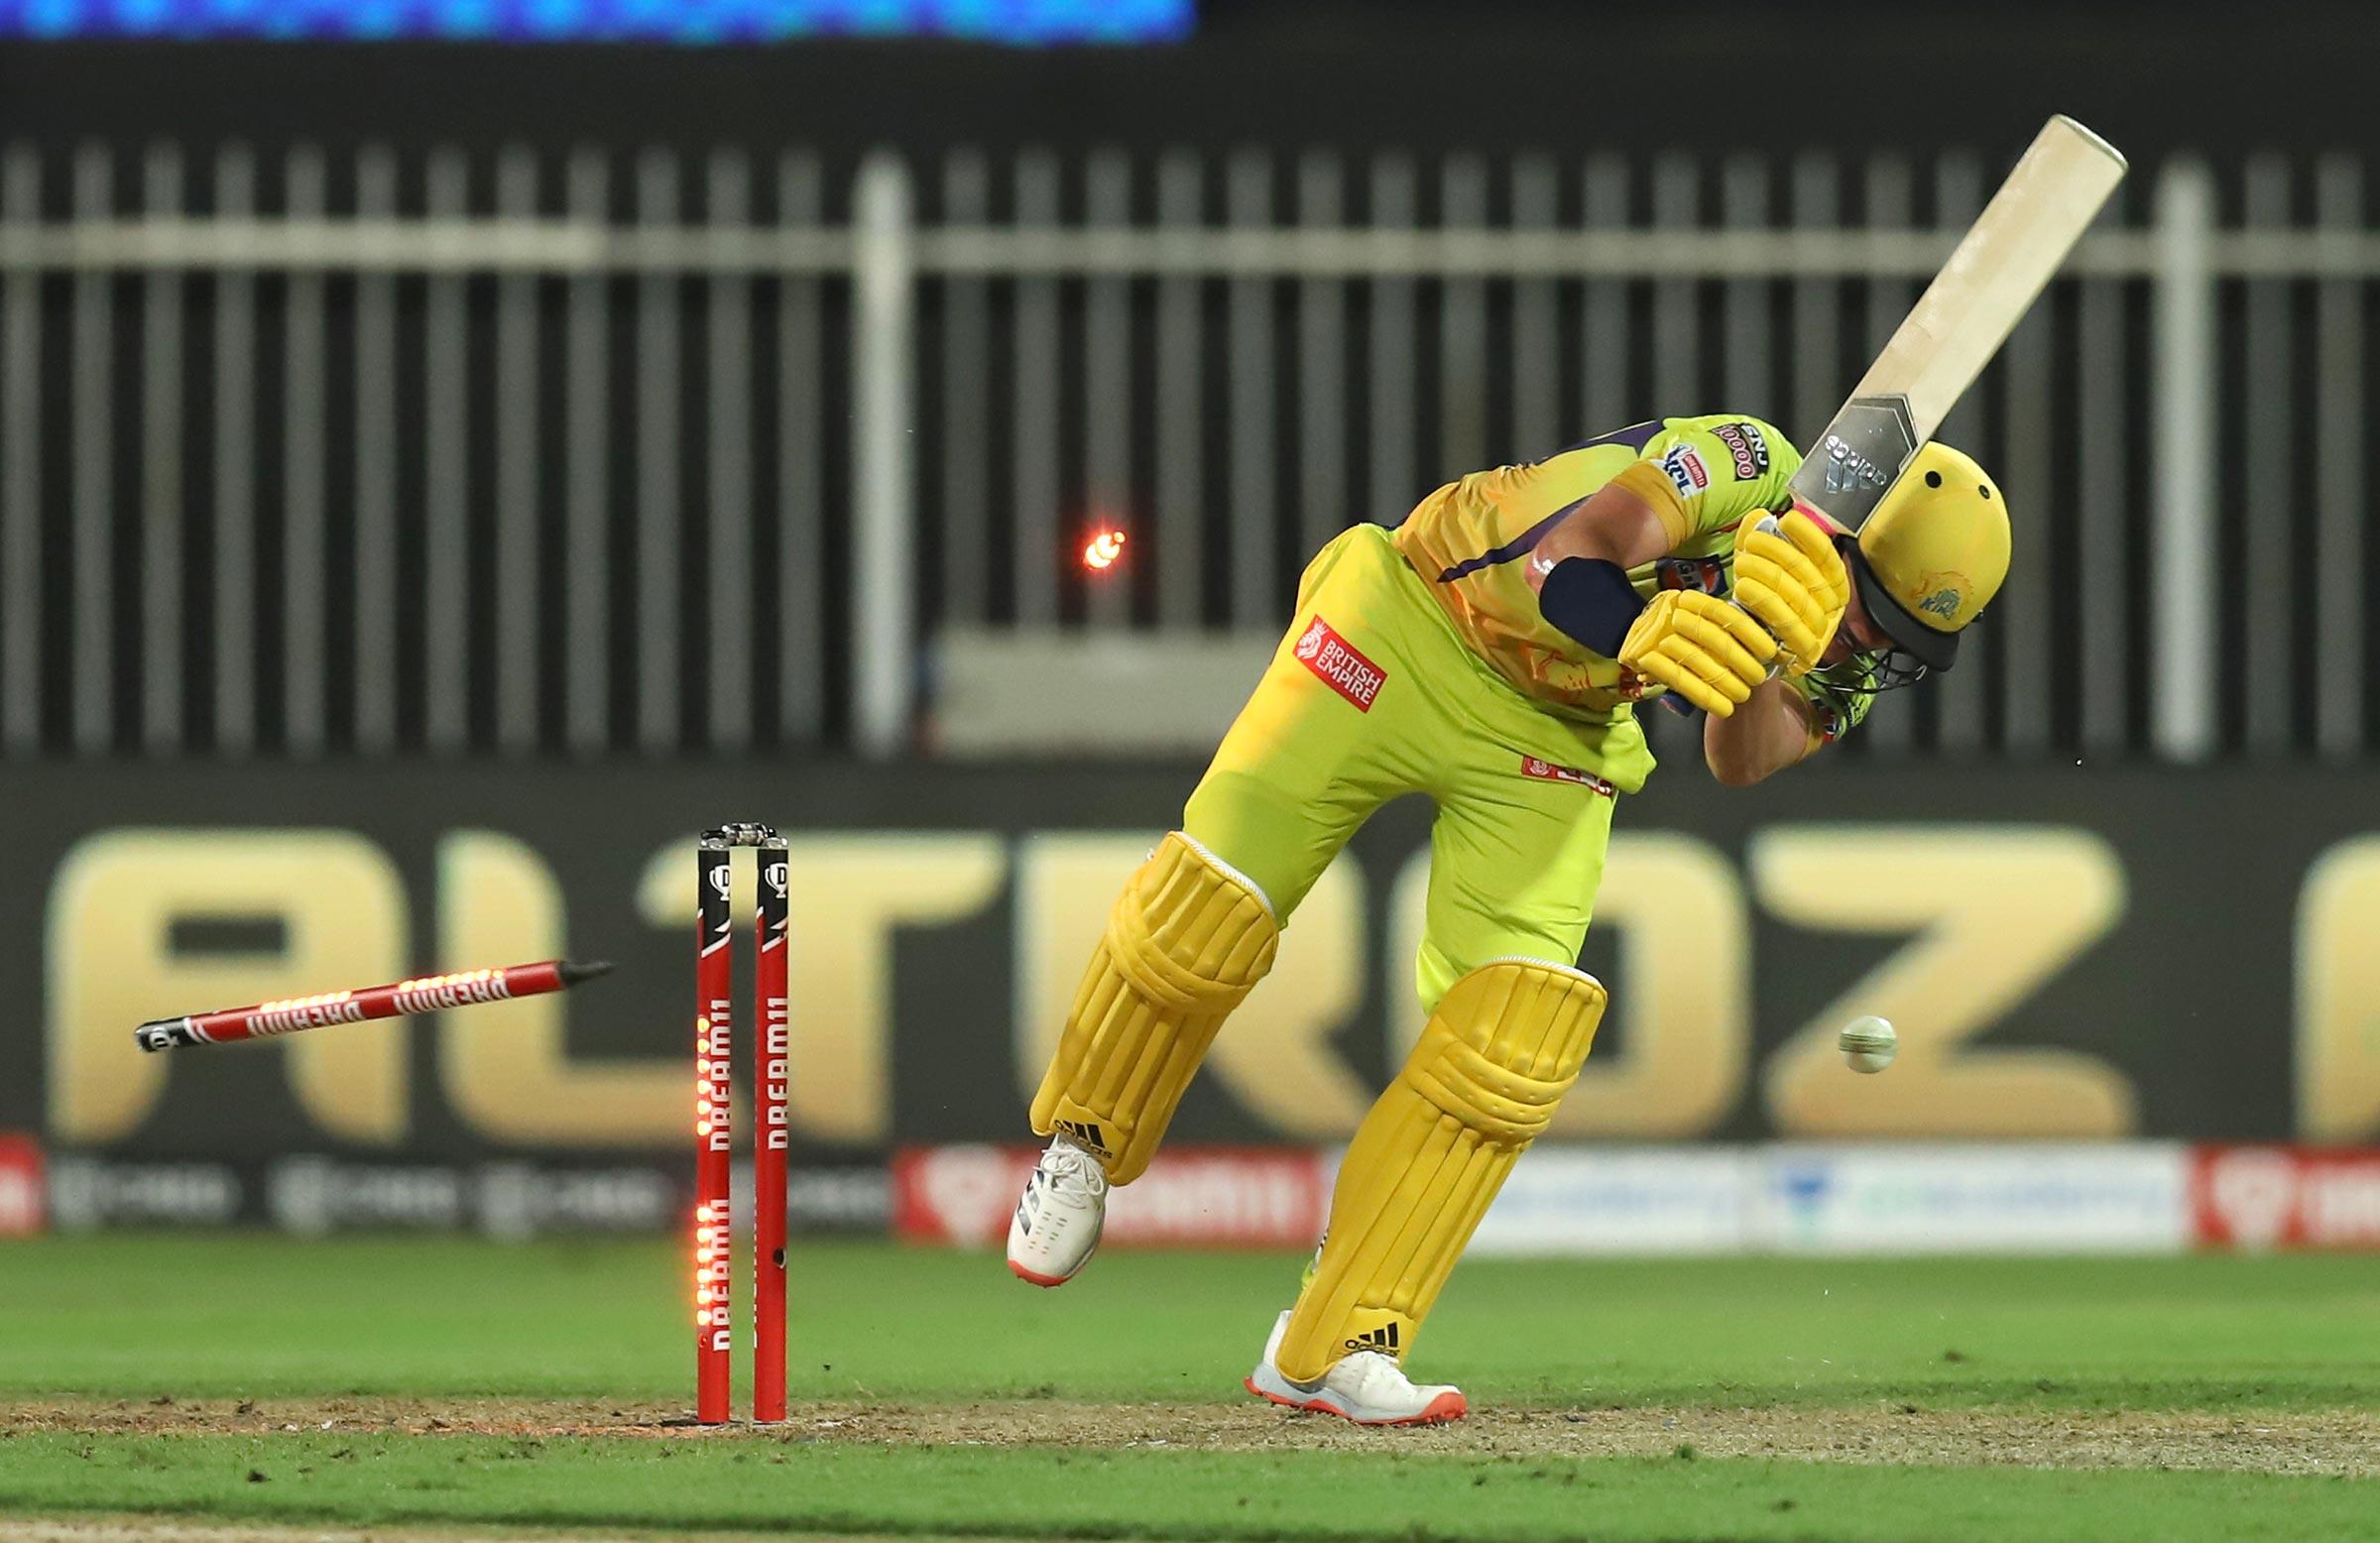 Bowled him! Boult cleans up Curran // BBCI/IPL